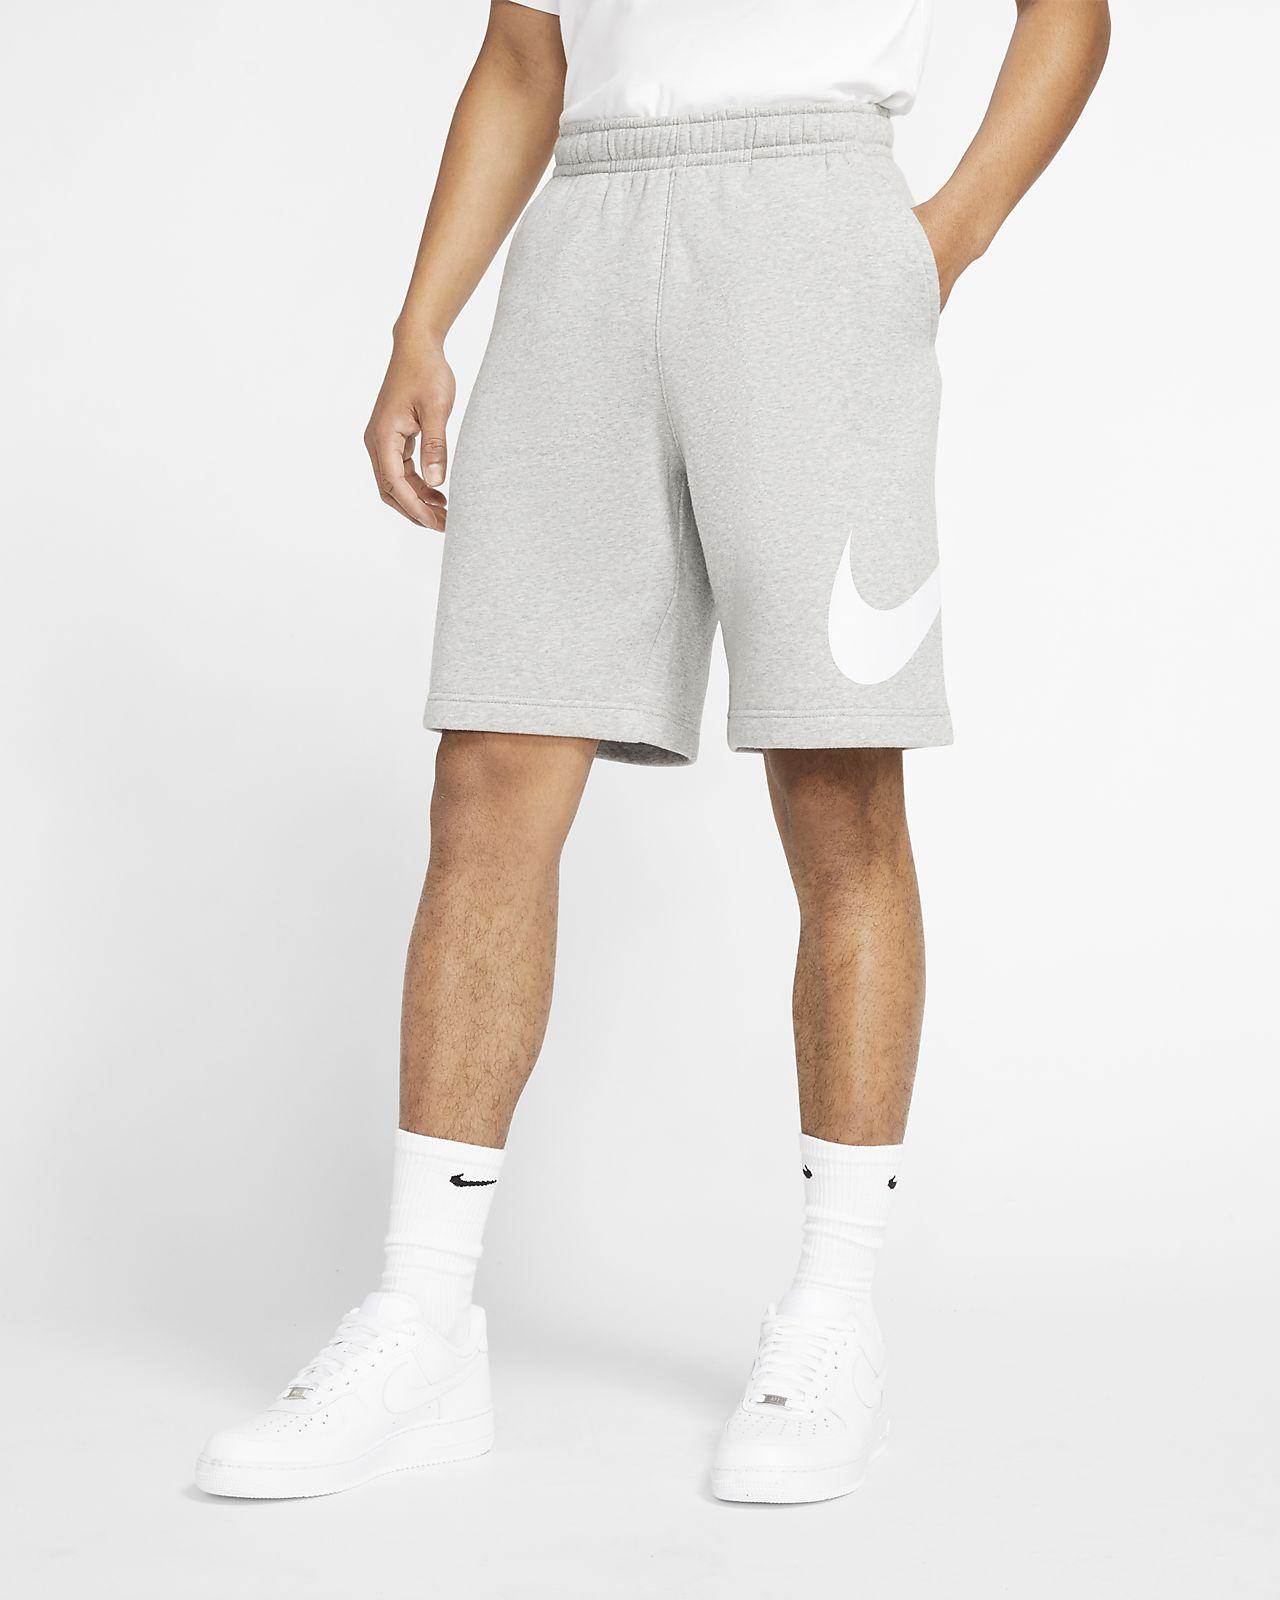 nike shorts grey Online Shopping for Women, Men, Kids ...